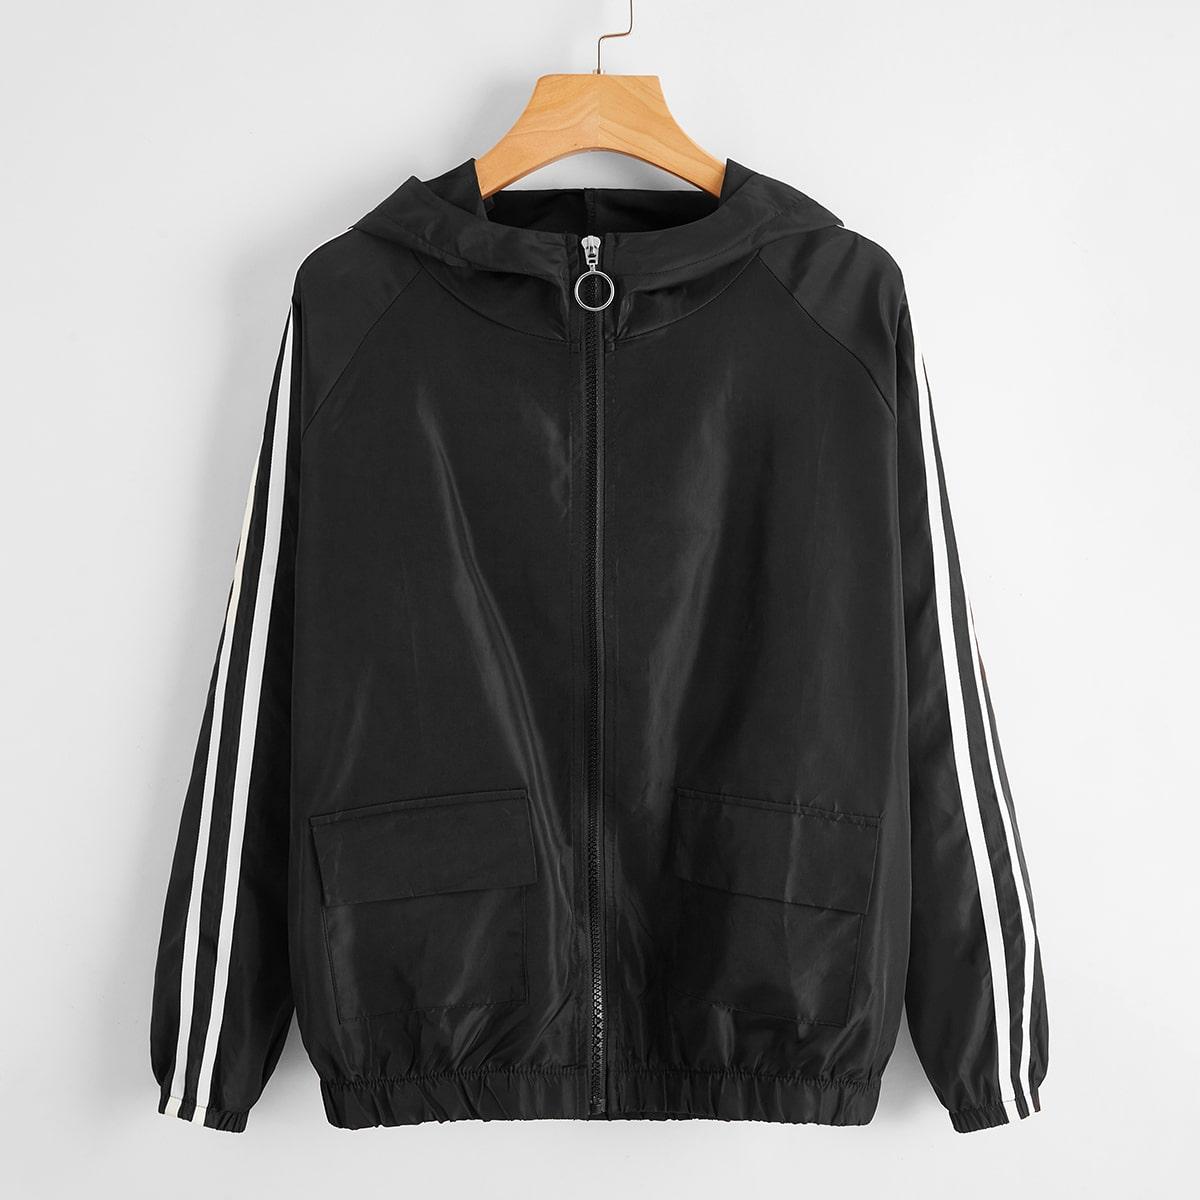 Куртка ветровка на молнией с полосками